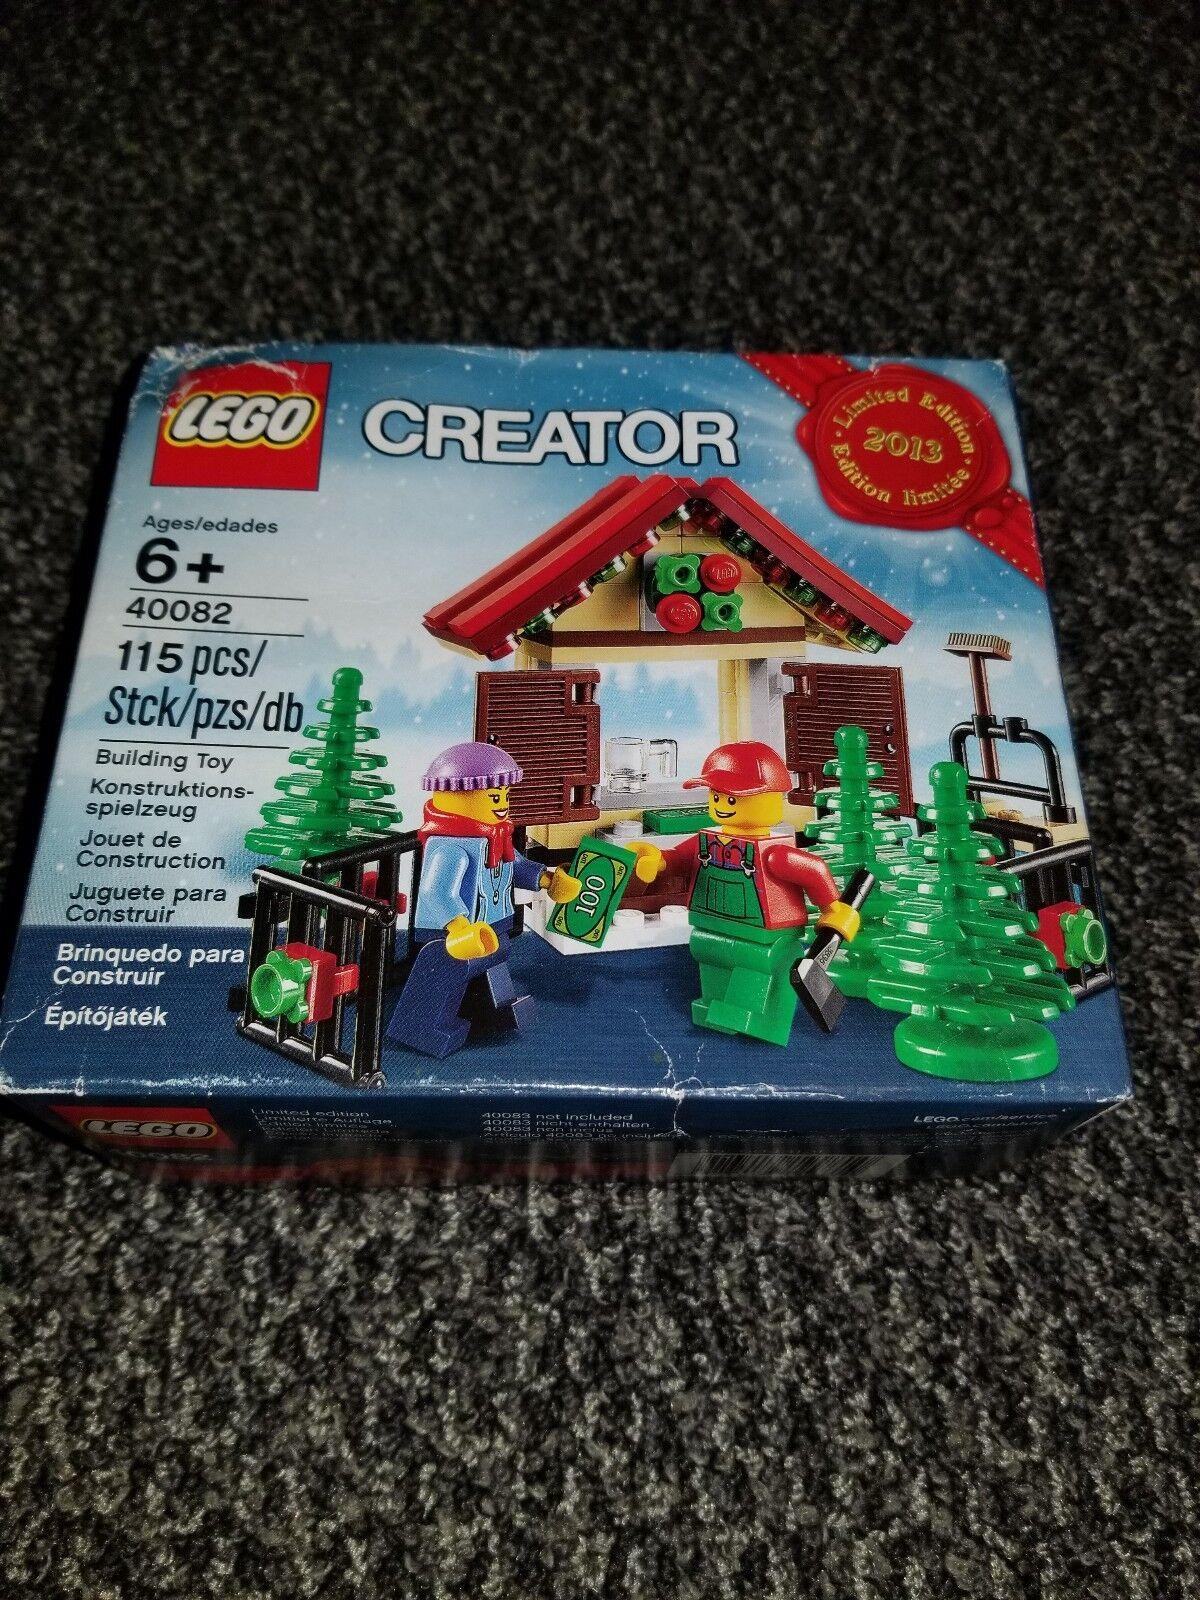 Lego creator 40082 Christmas 2013